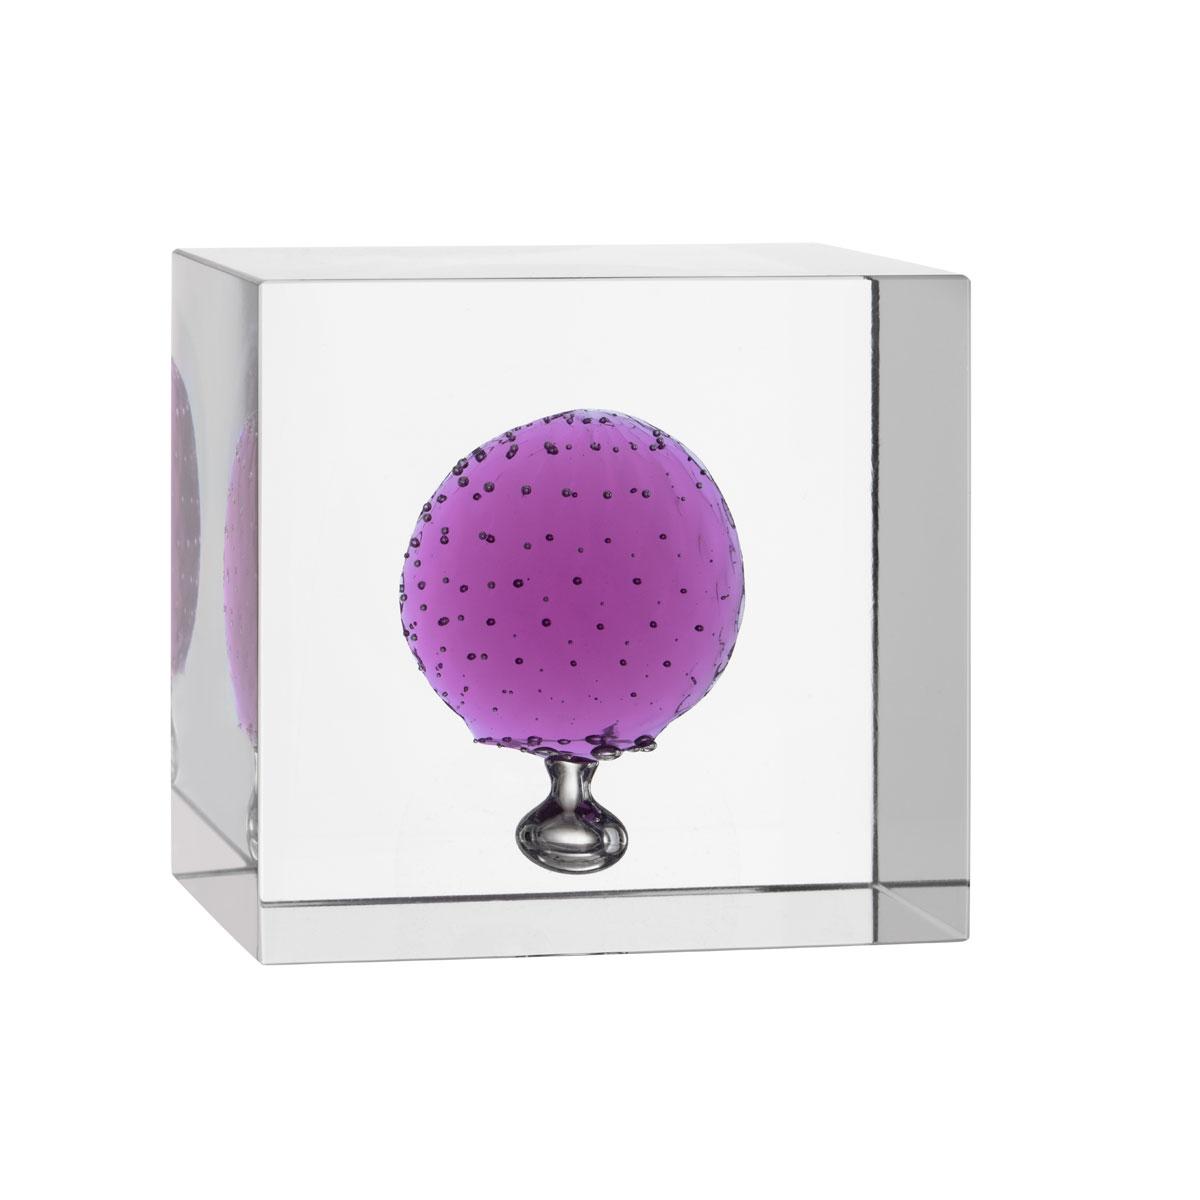 Iittala Annual Cube 2021